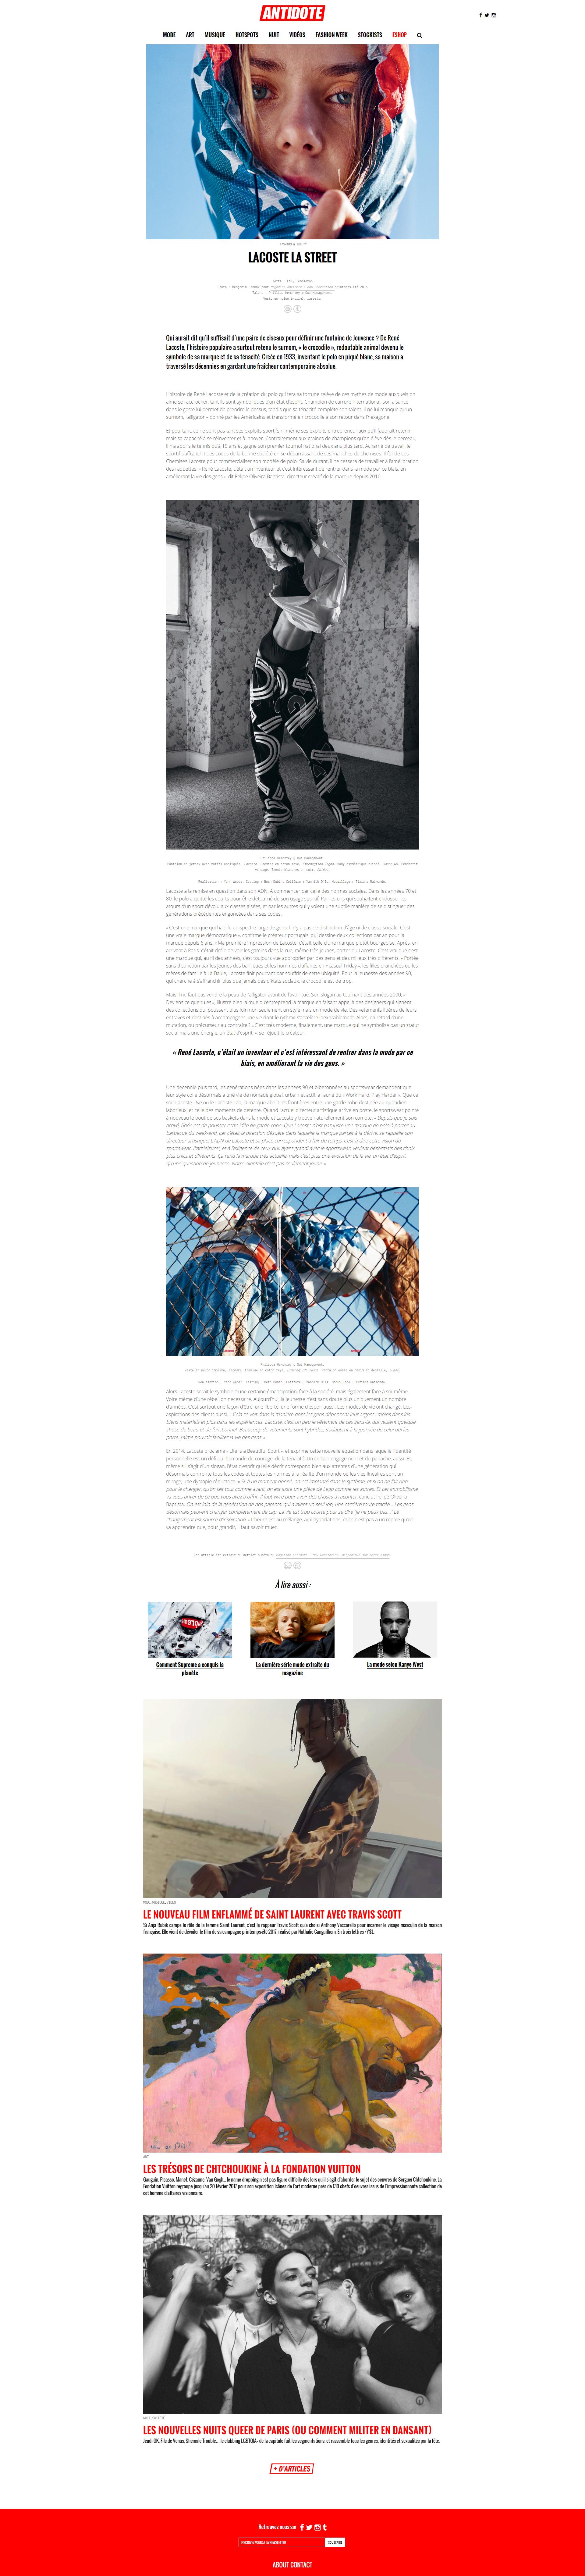 screencapture-magazineantidote-mode-lacoste-histoire-d-un-mythe-1478386474644